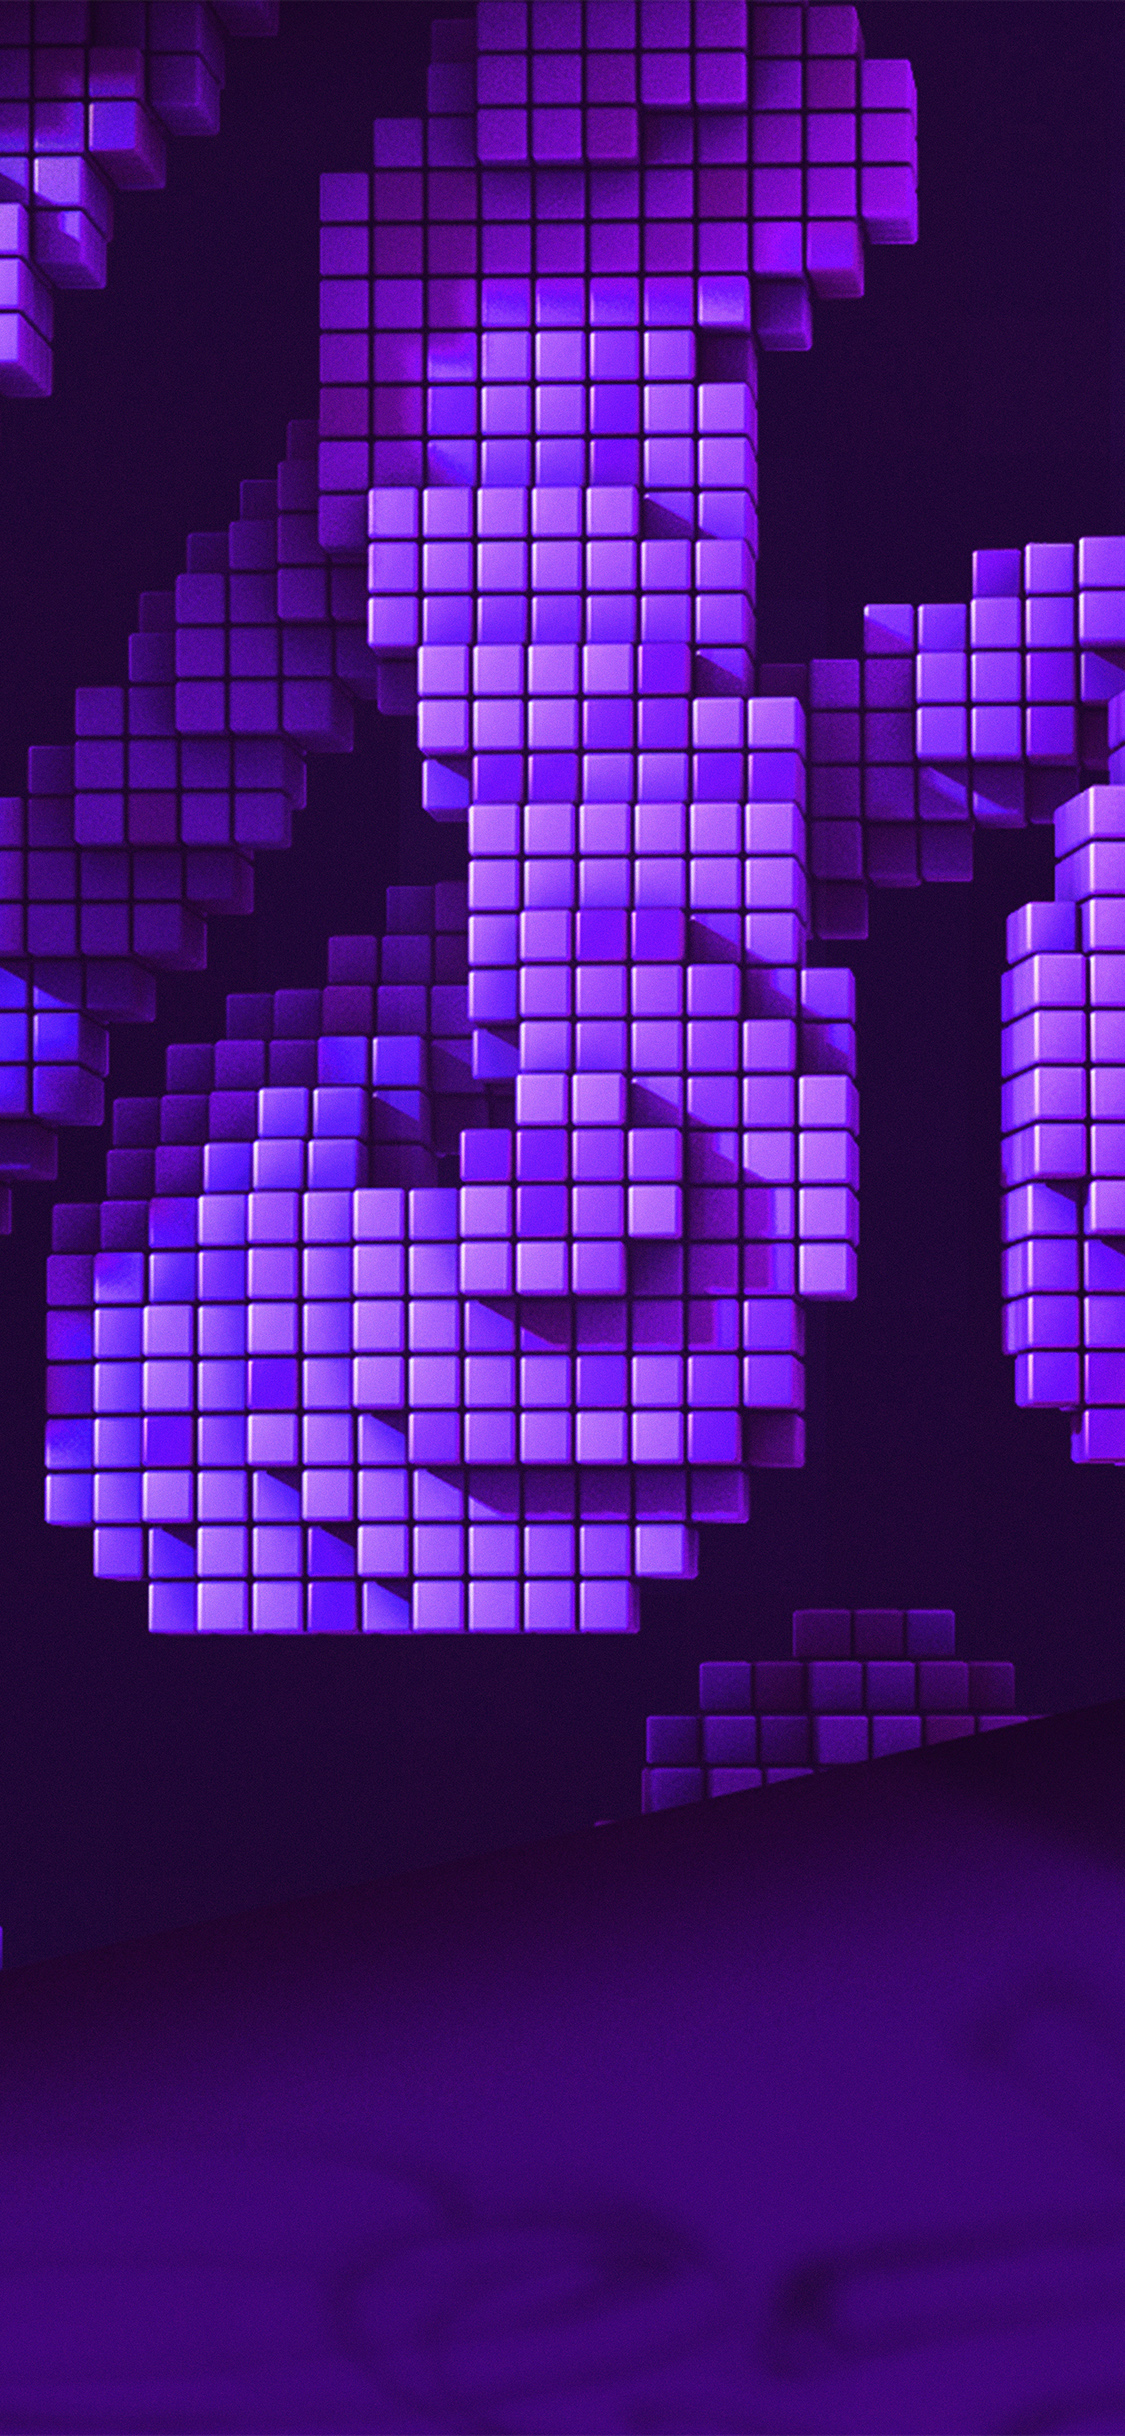 Iphonexpapers Com Iphone X Wallpaper Vw92 Digital Pixel Art Purple Pattern Background